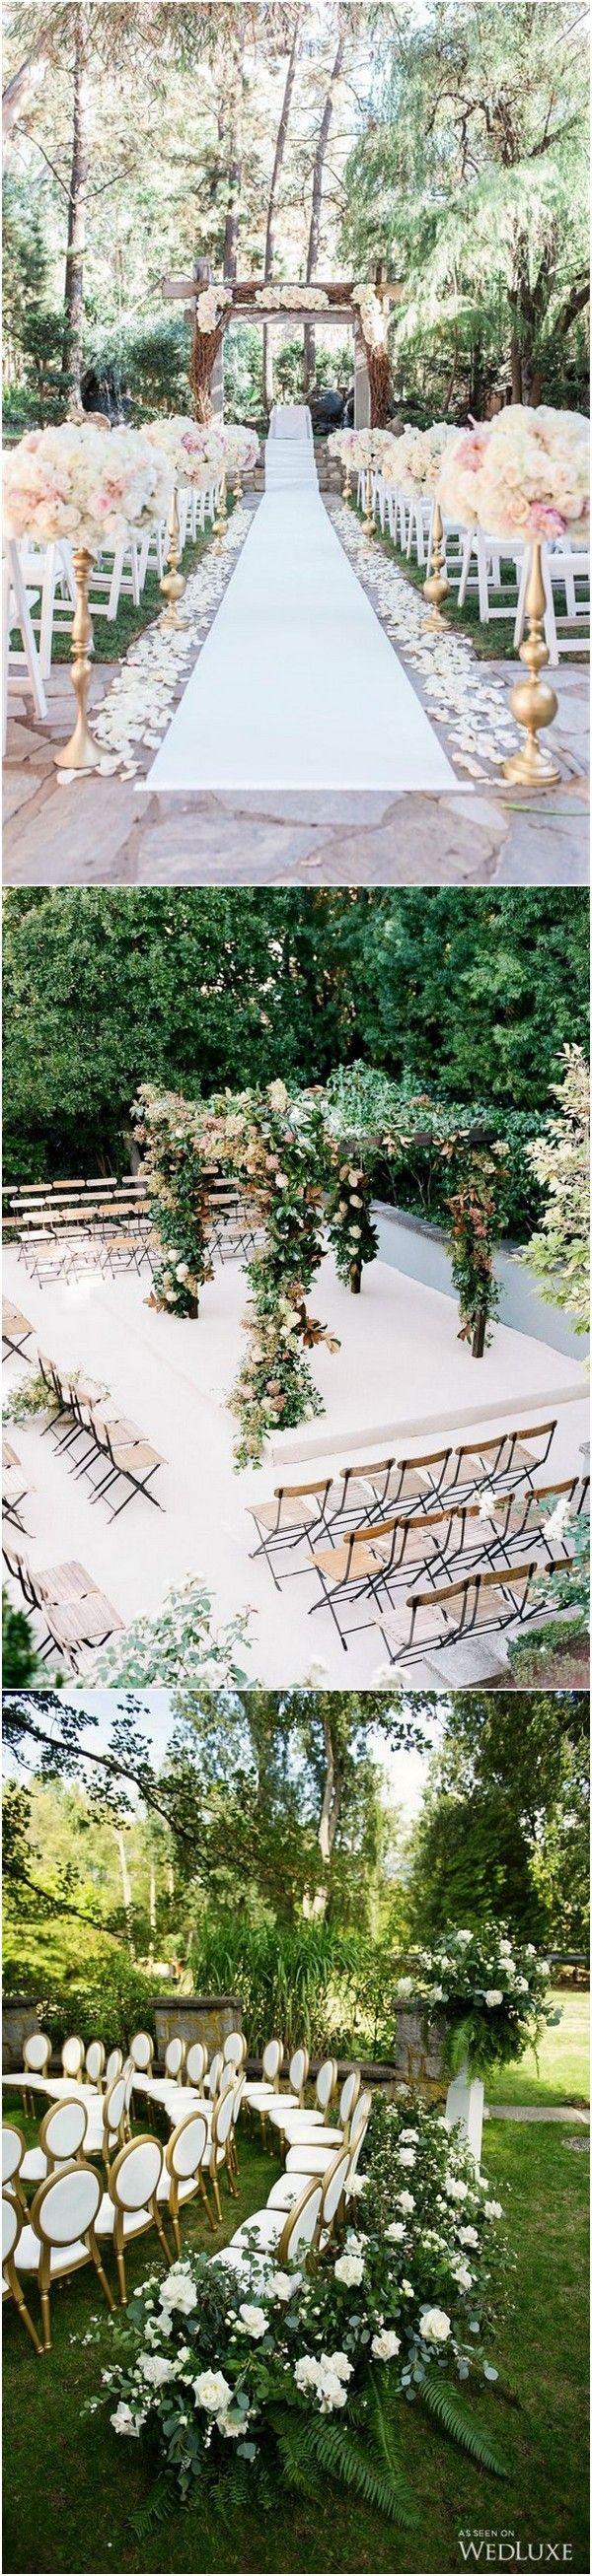 25 Brilliant Garden Wedding Decoration Ideas for 2018 Trends ...